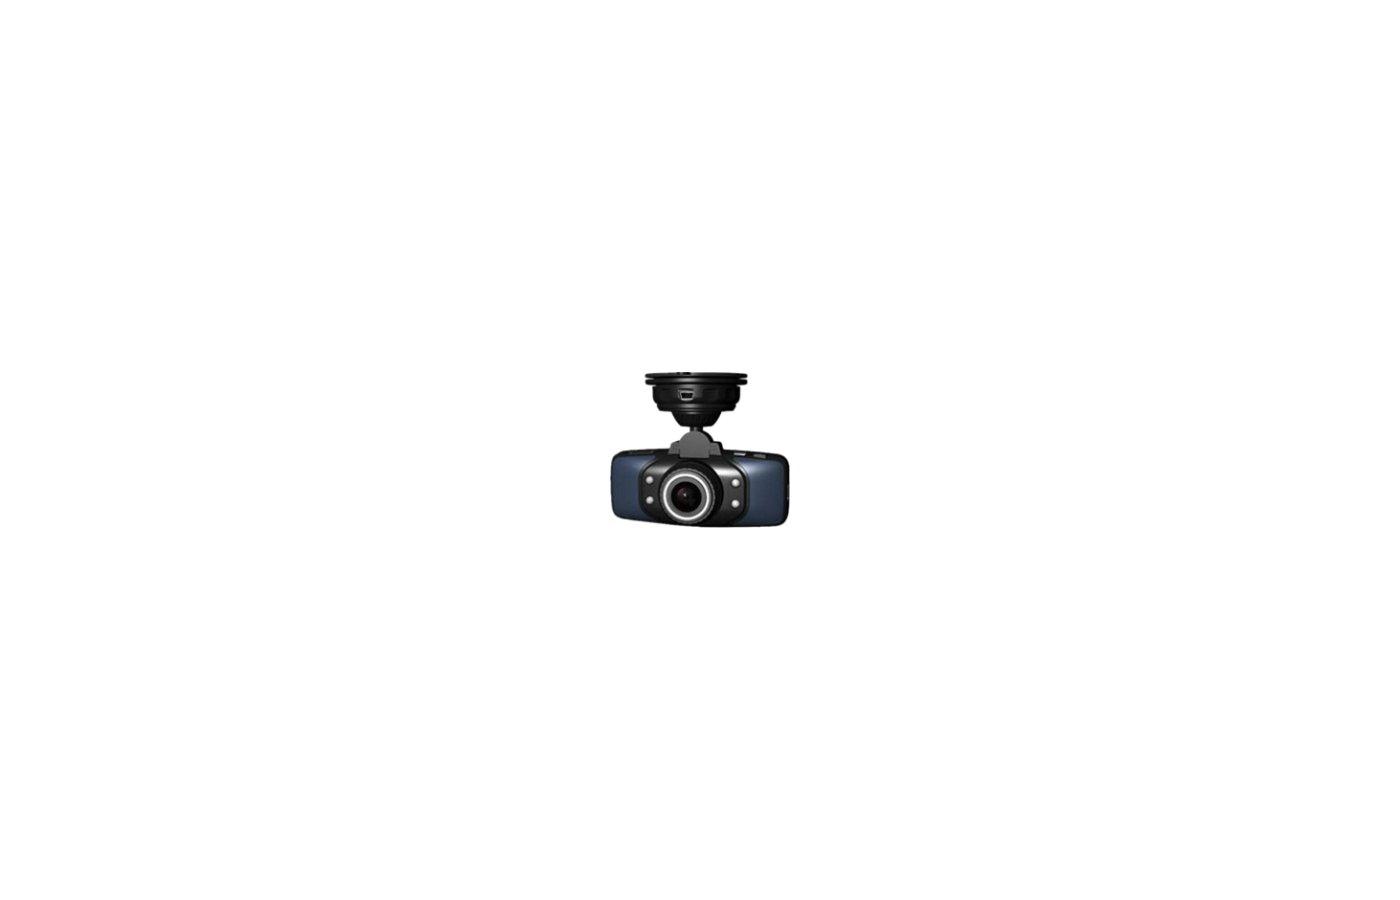 Видеорегистратор Sho-Me HD-7000 SX